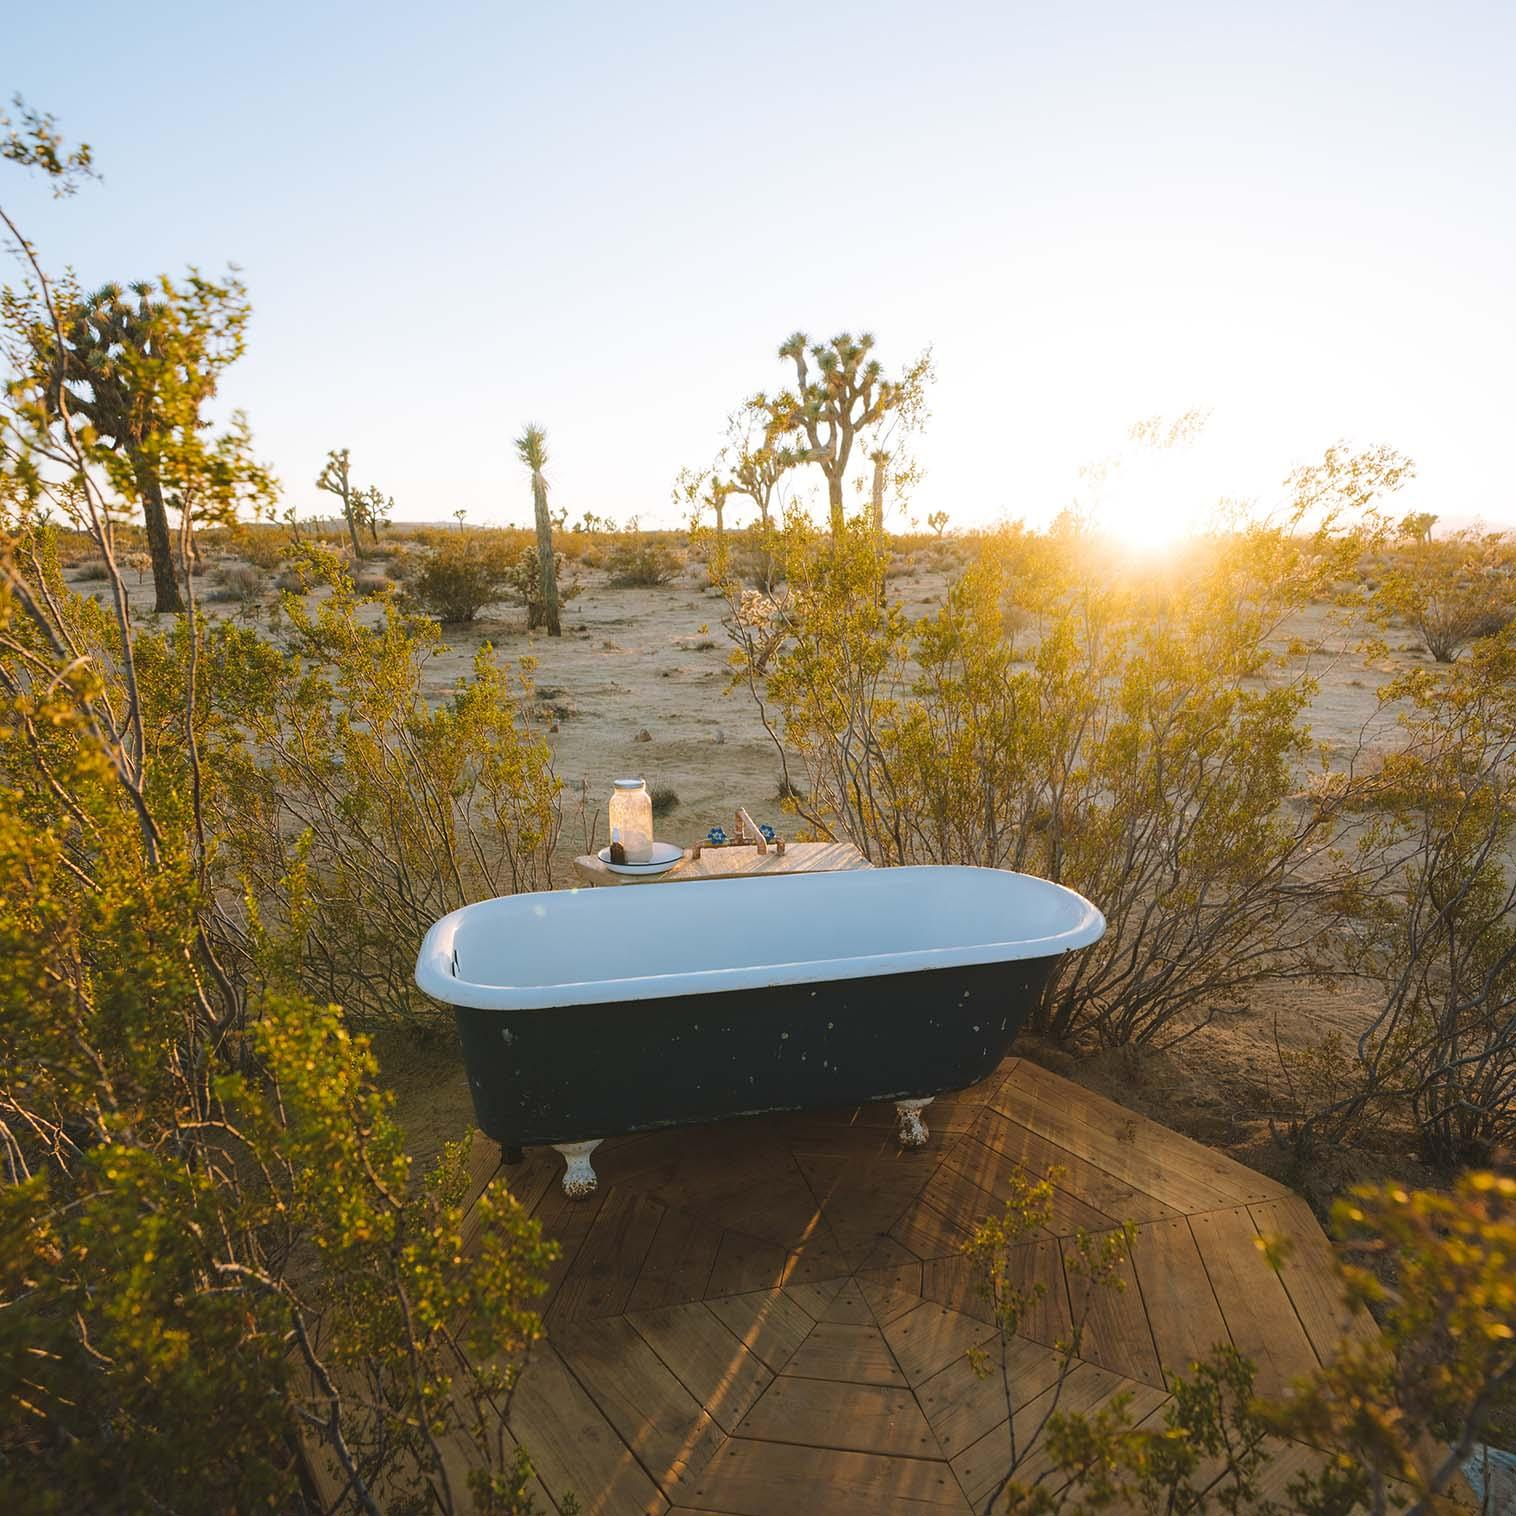 Bath tub in desert